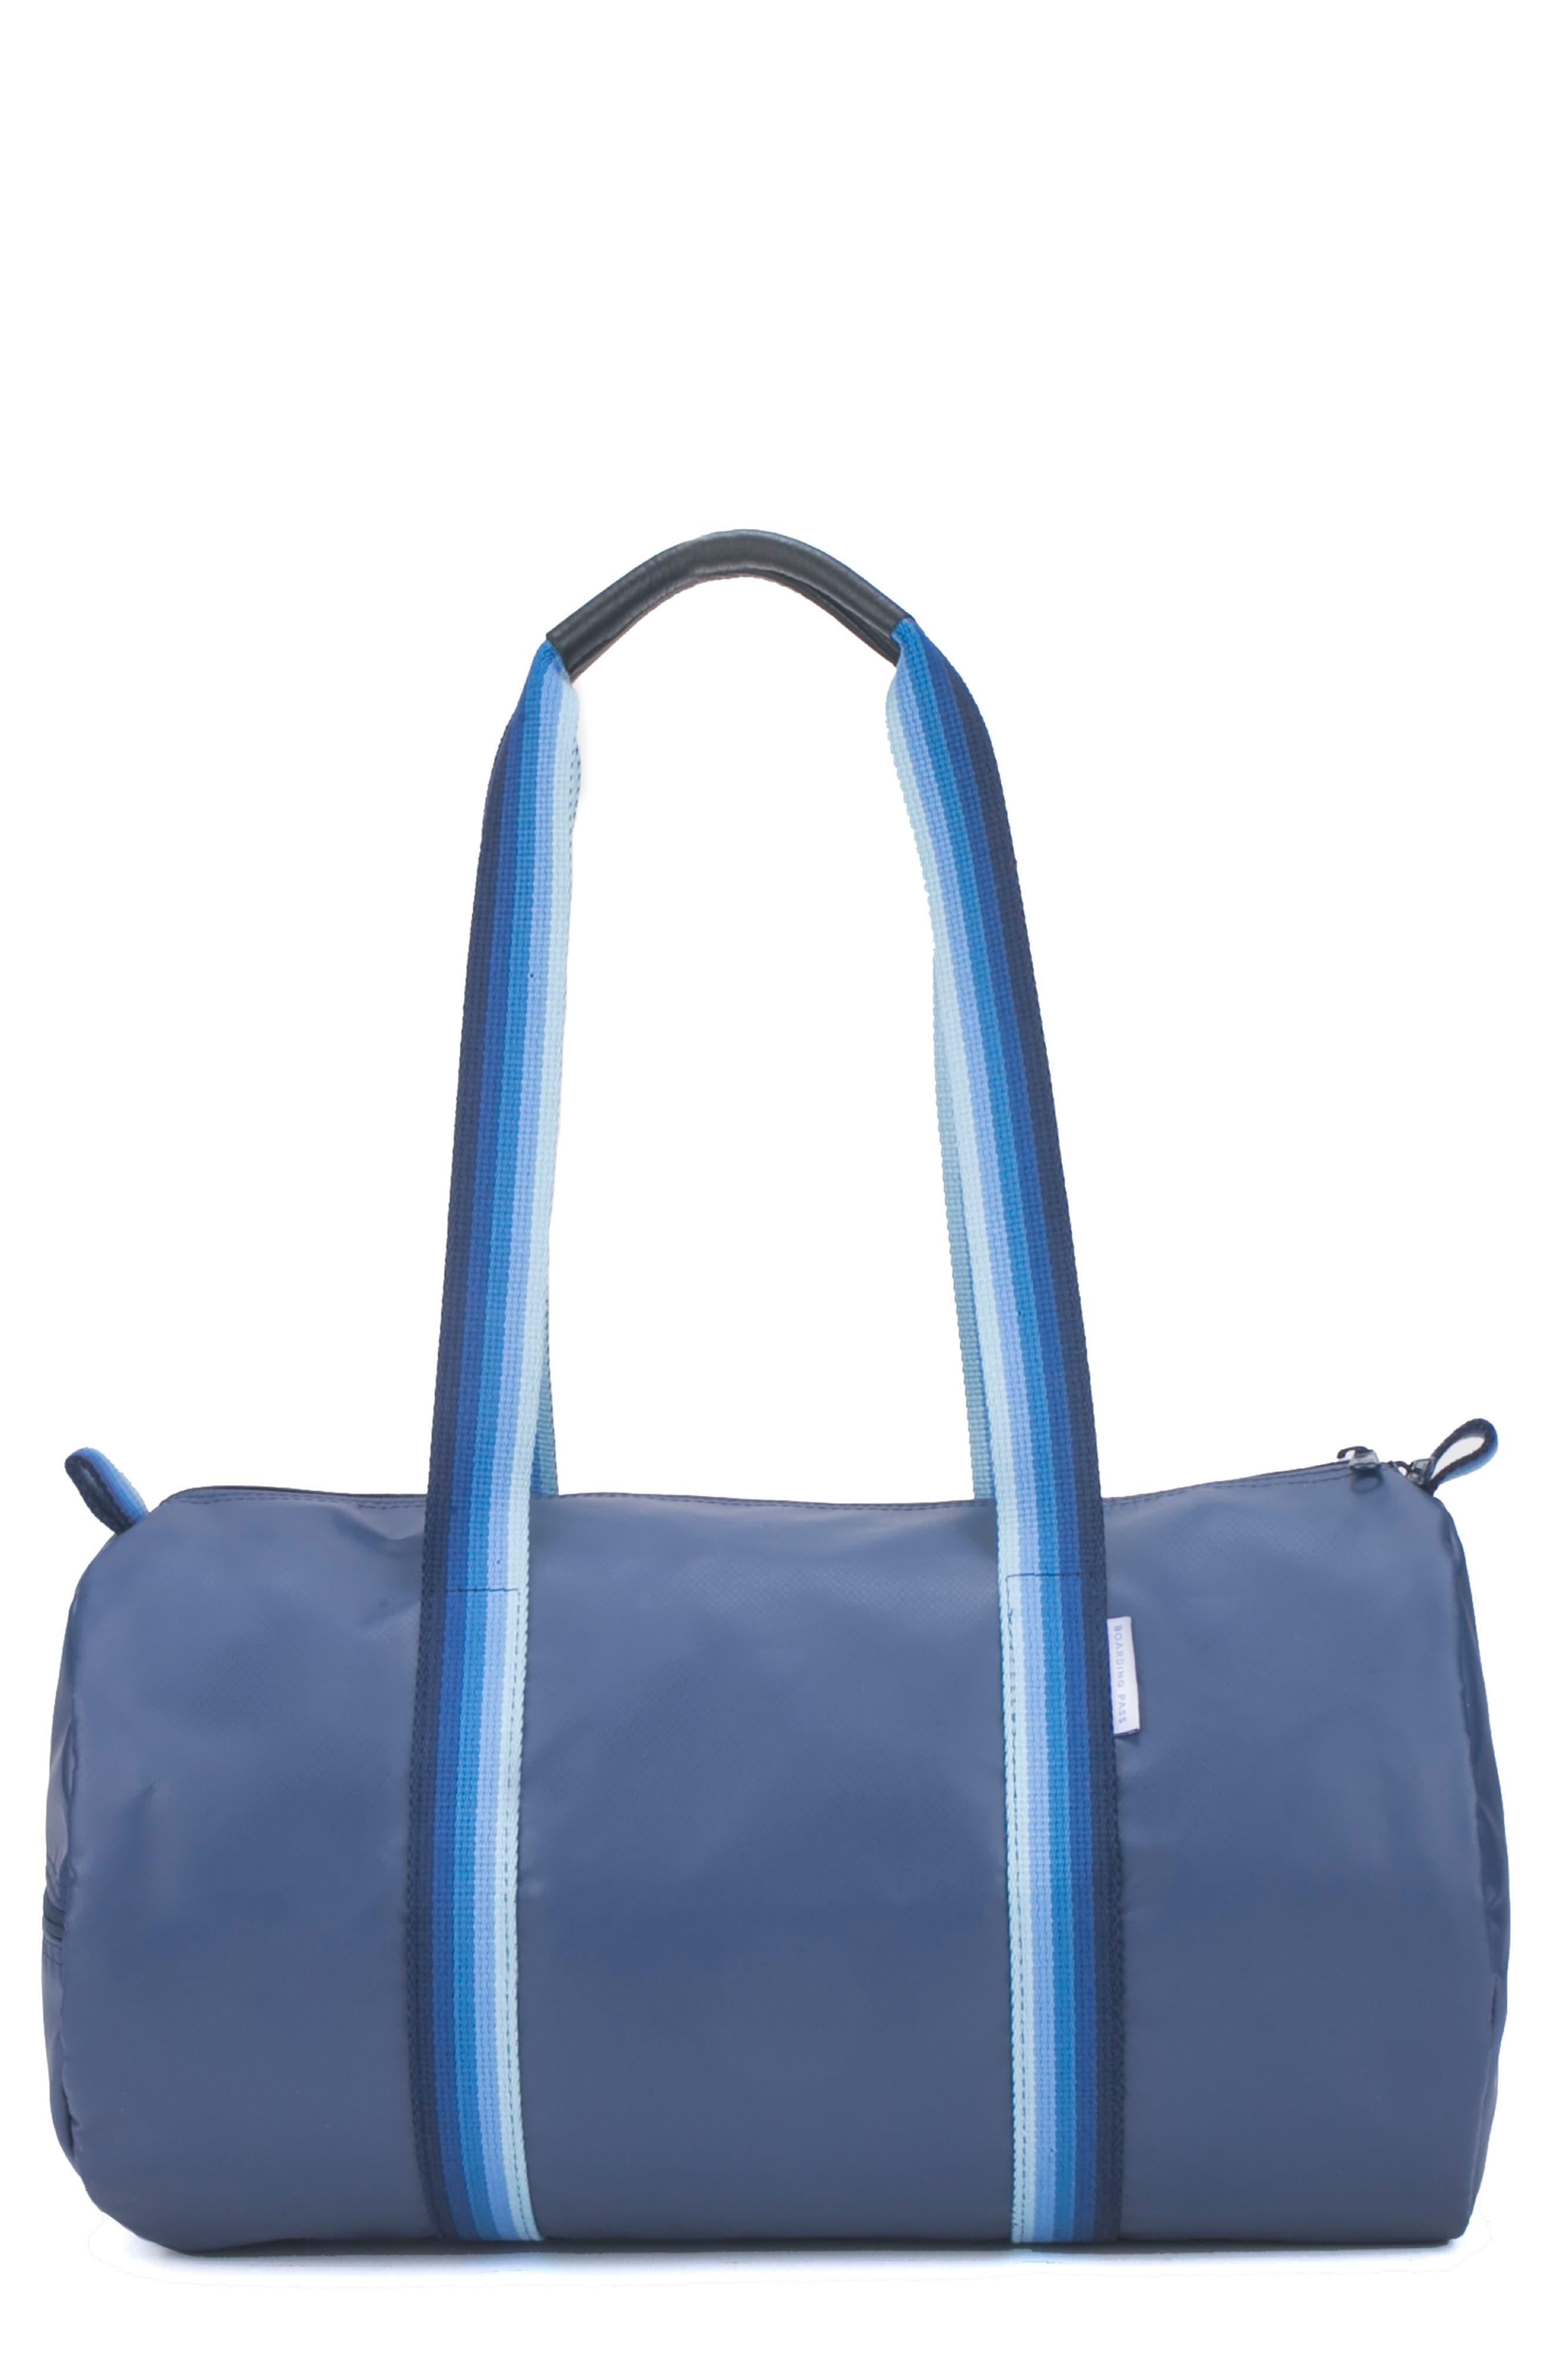 BOARDING PASS Lifestyle Duffel Bag - Blue